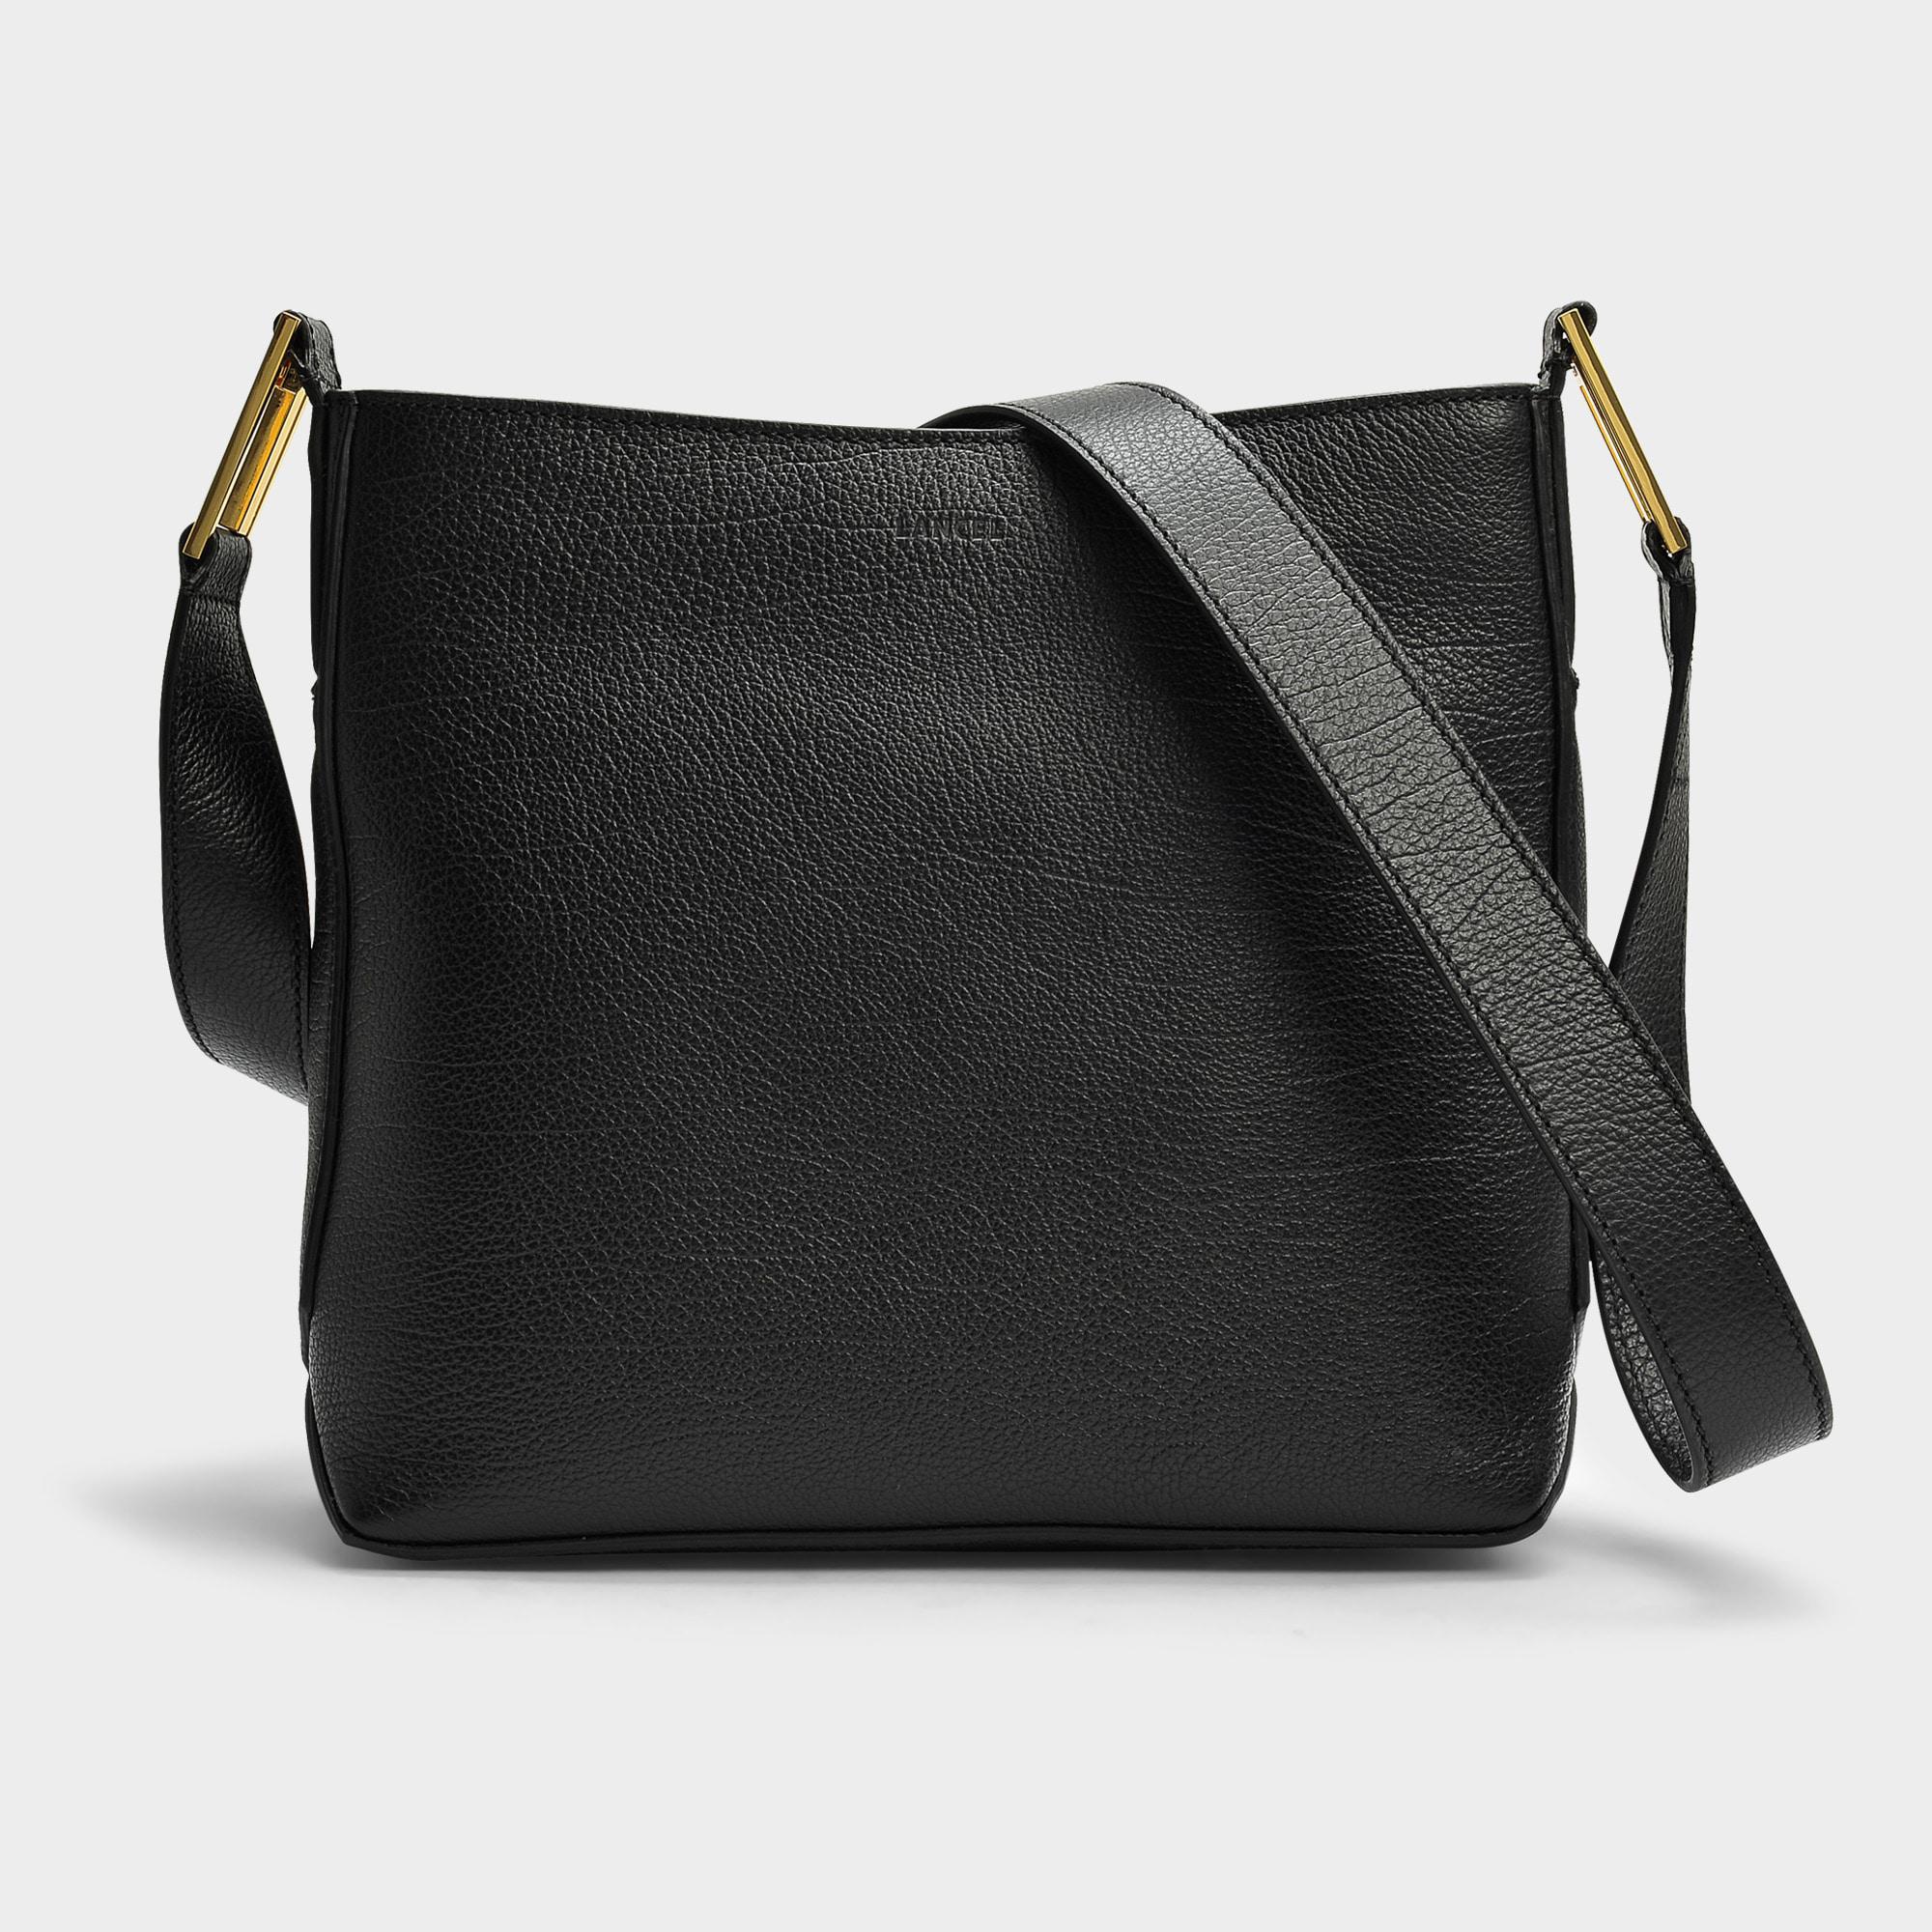 c8036fe961 Lyst - Lancel Max S Zip Crossbody Bag In Black Grained Leather in Black